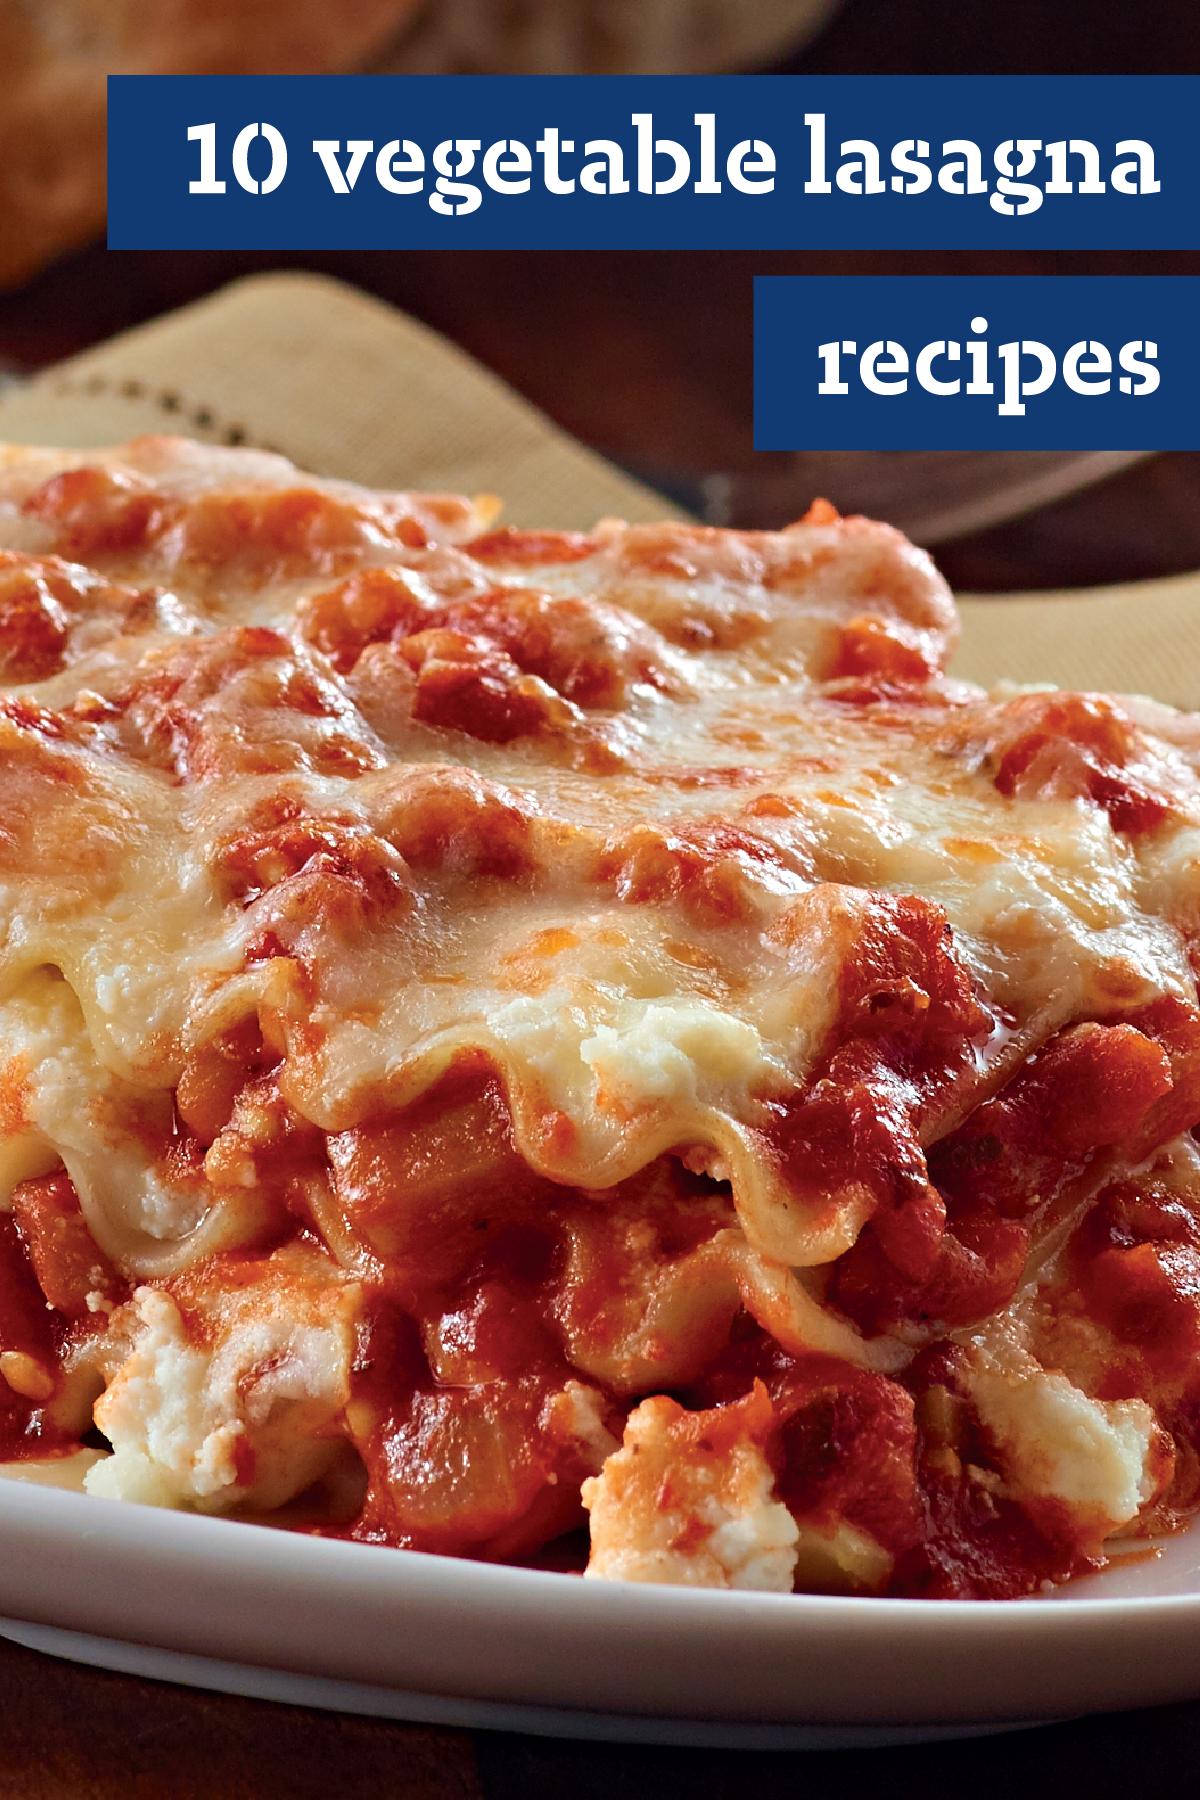 10 Vegetable Lasagna Recipes Our Vegetable Lasagna Recipes Are A Take On Traditional Lasagna Similar To How Vegetable Lasagna Recipes Recipes Lasagna Recipe